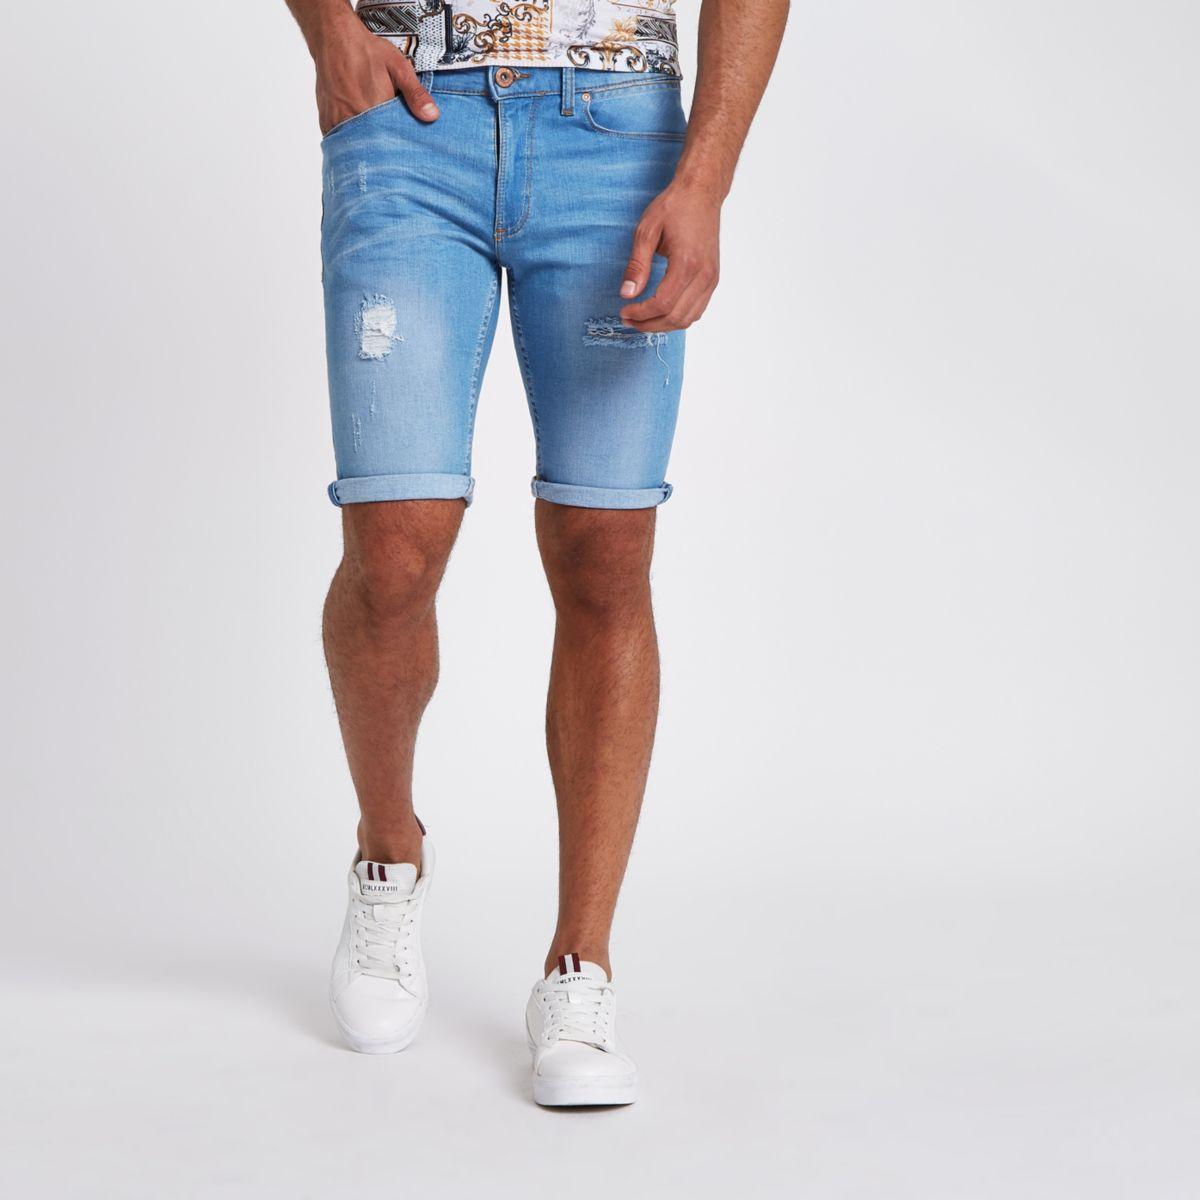 light blue wash skinny ripped denim shorts casual shorts